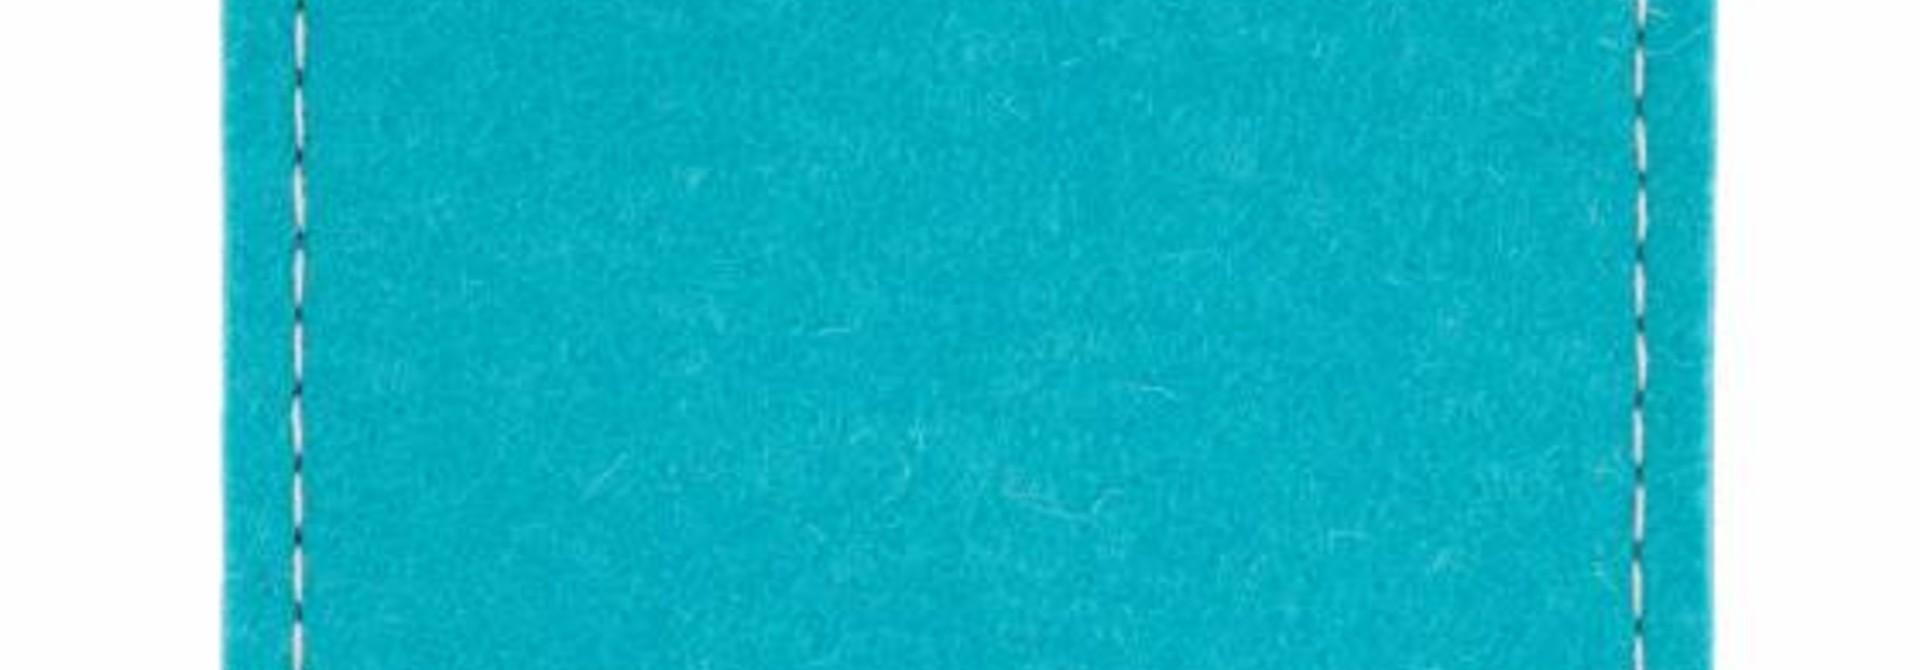 U / Desire / One Sleeve Turquoise